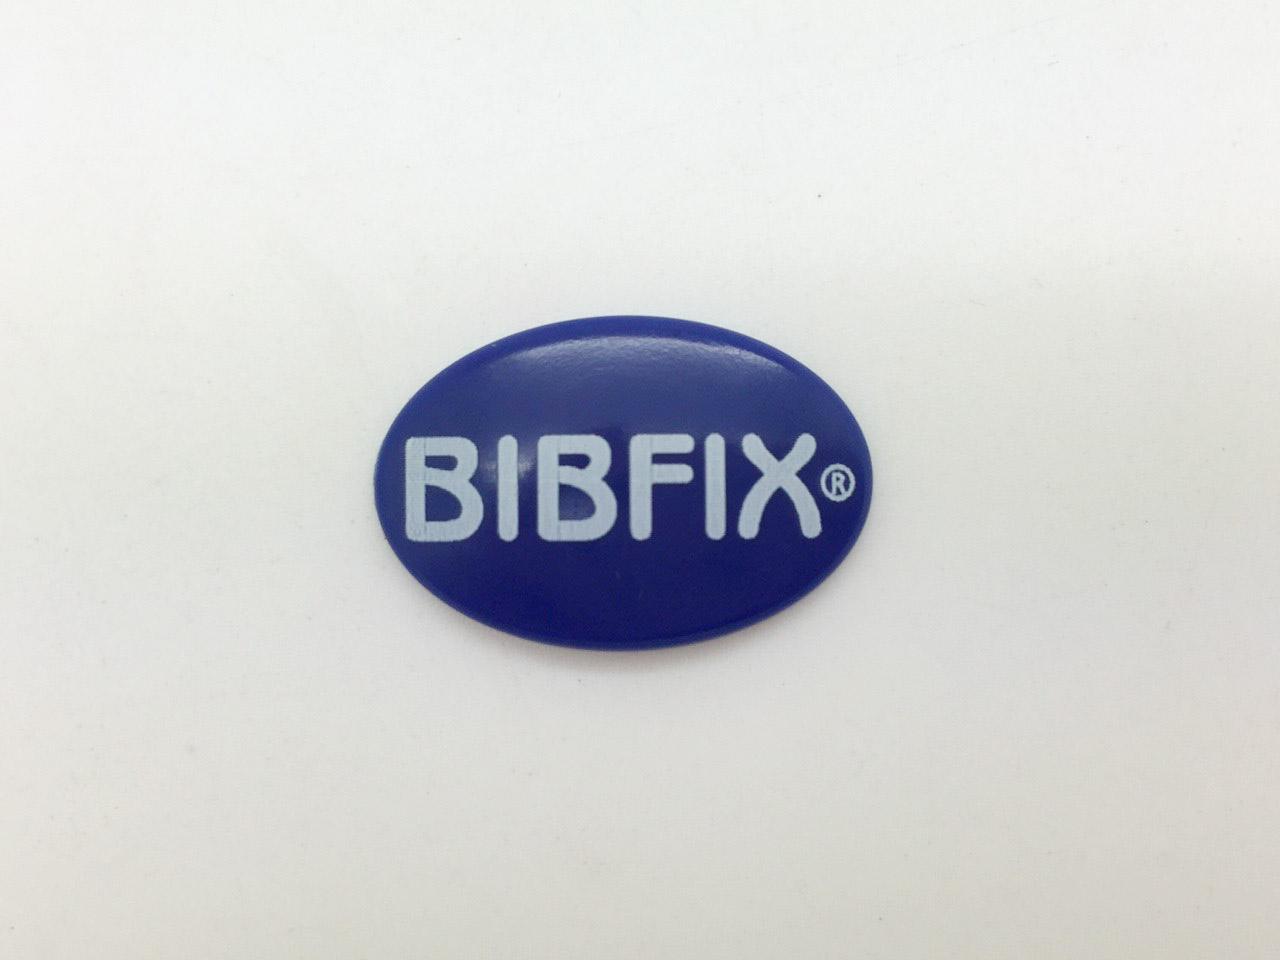 Bibfix號碼布塑膠扣 (深藍)